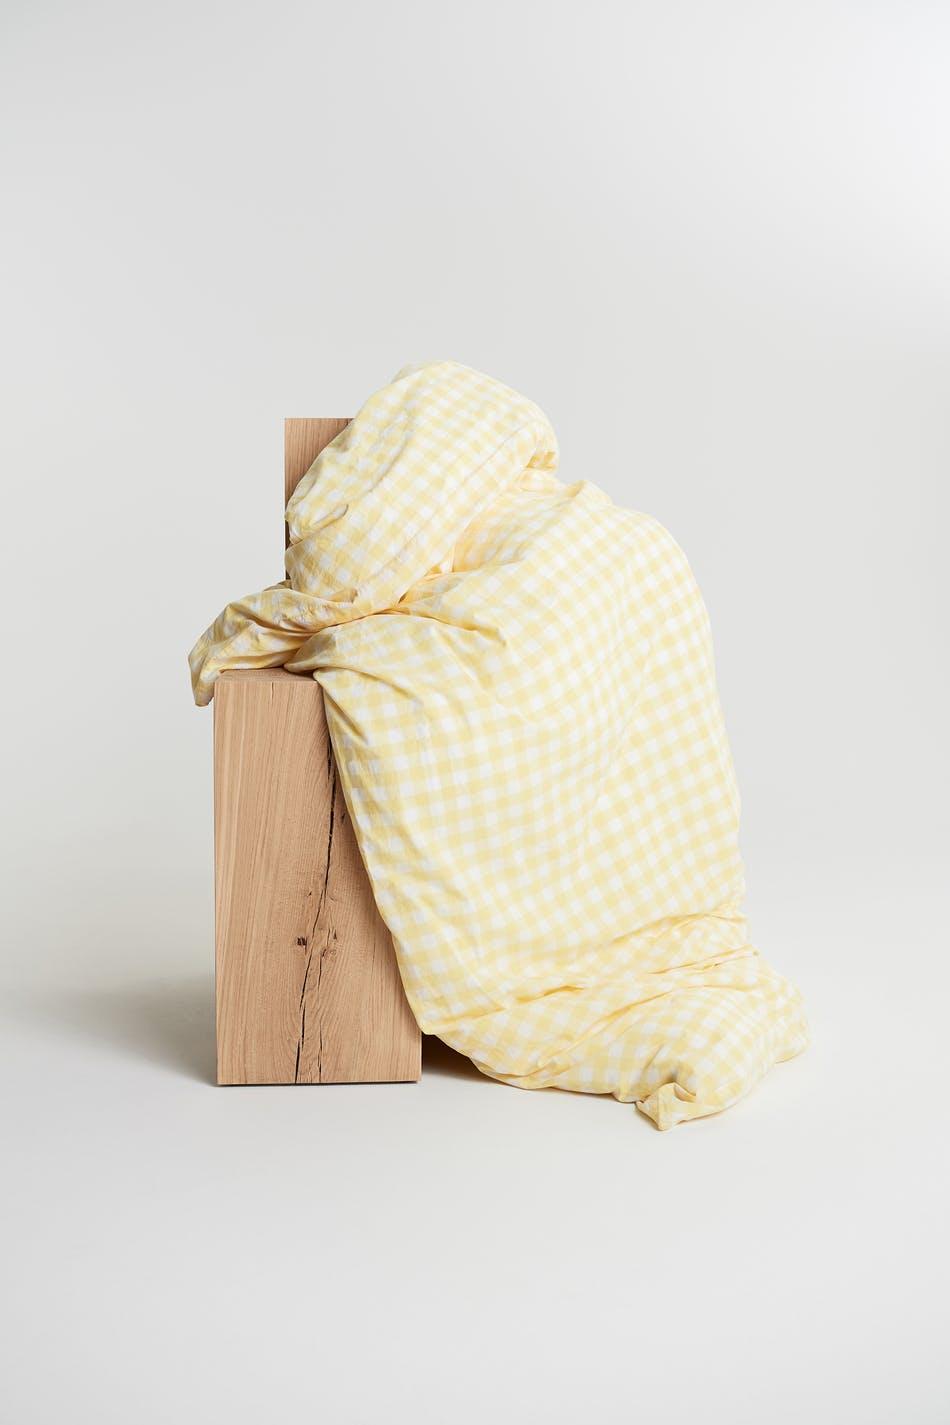 Rutete, gult sengesett